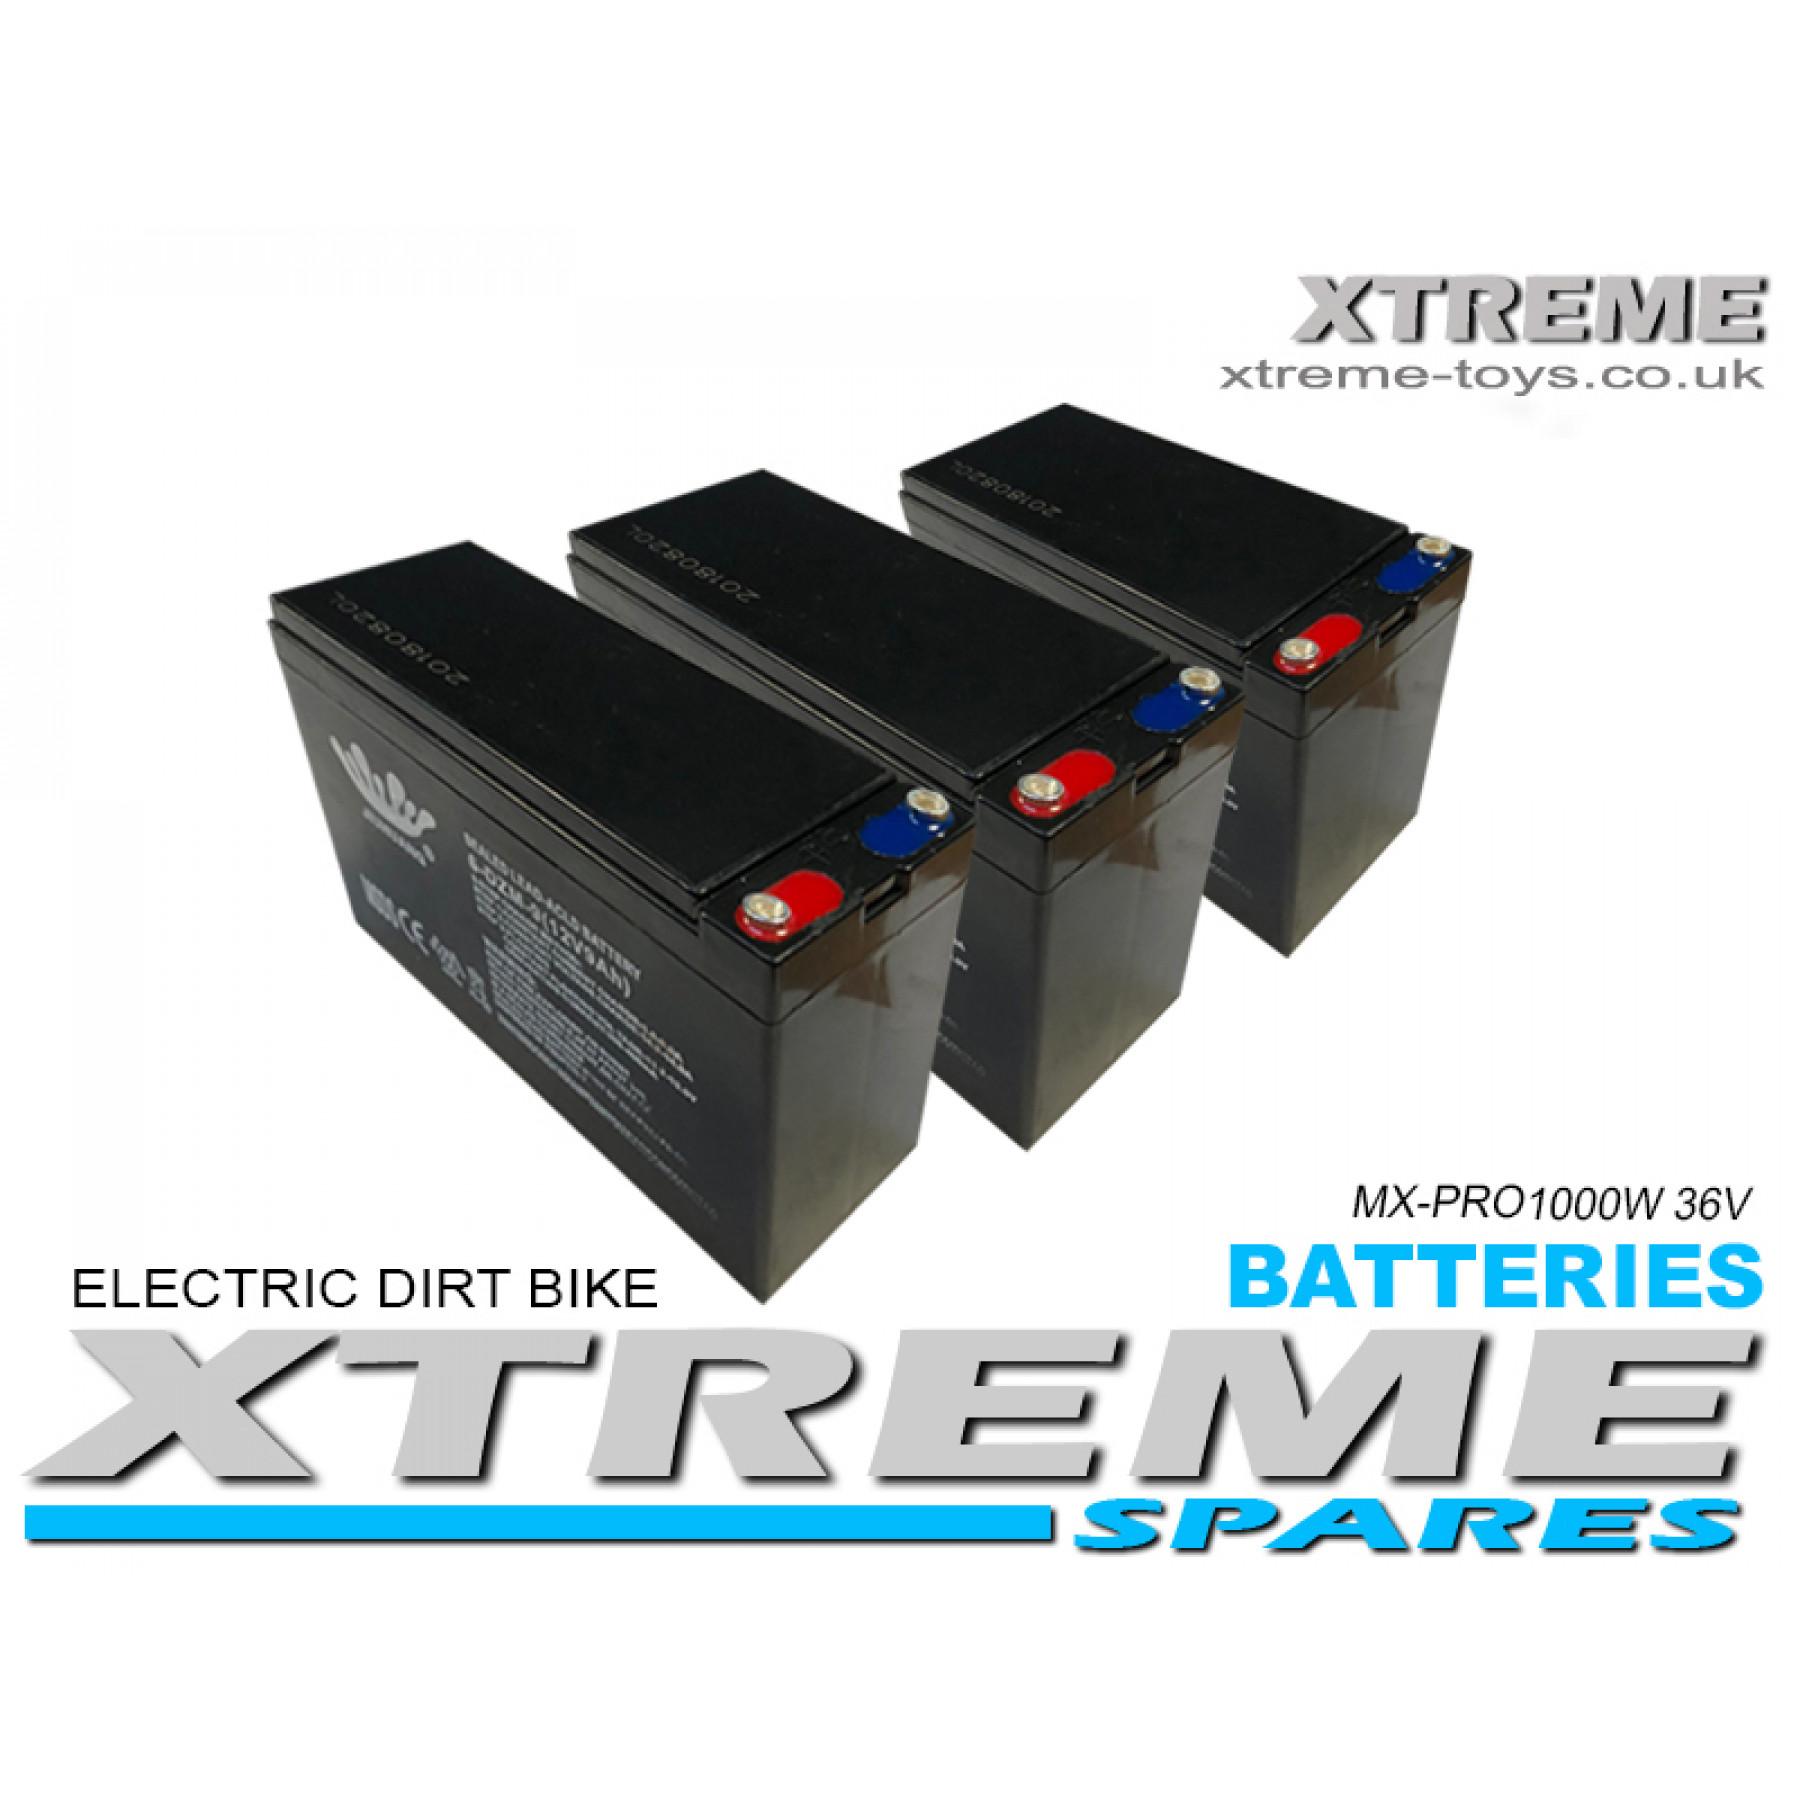 XTREME ELECTRIC XTM MX-PRO 36V 1000W REPLACEMENT BATTERY SET